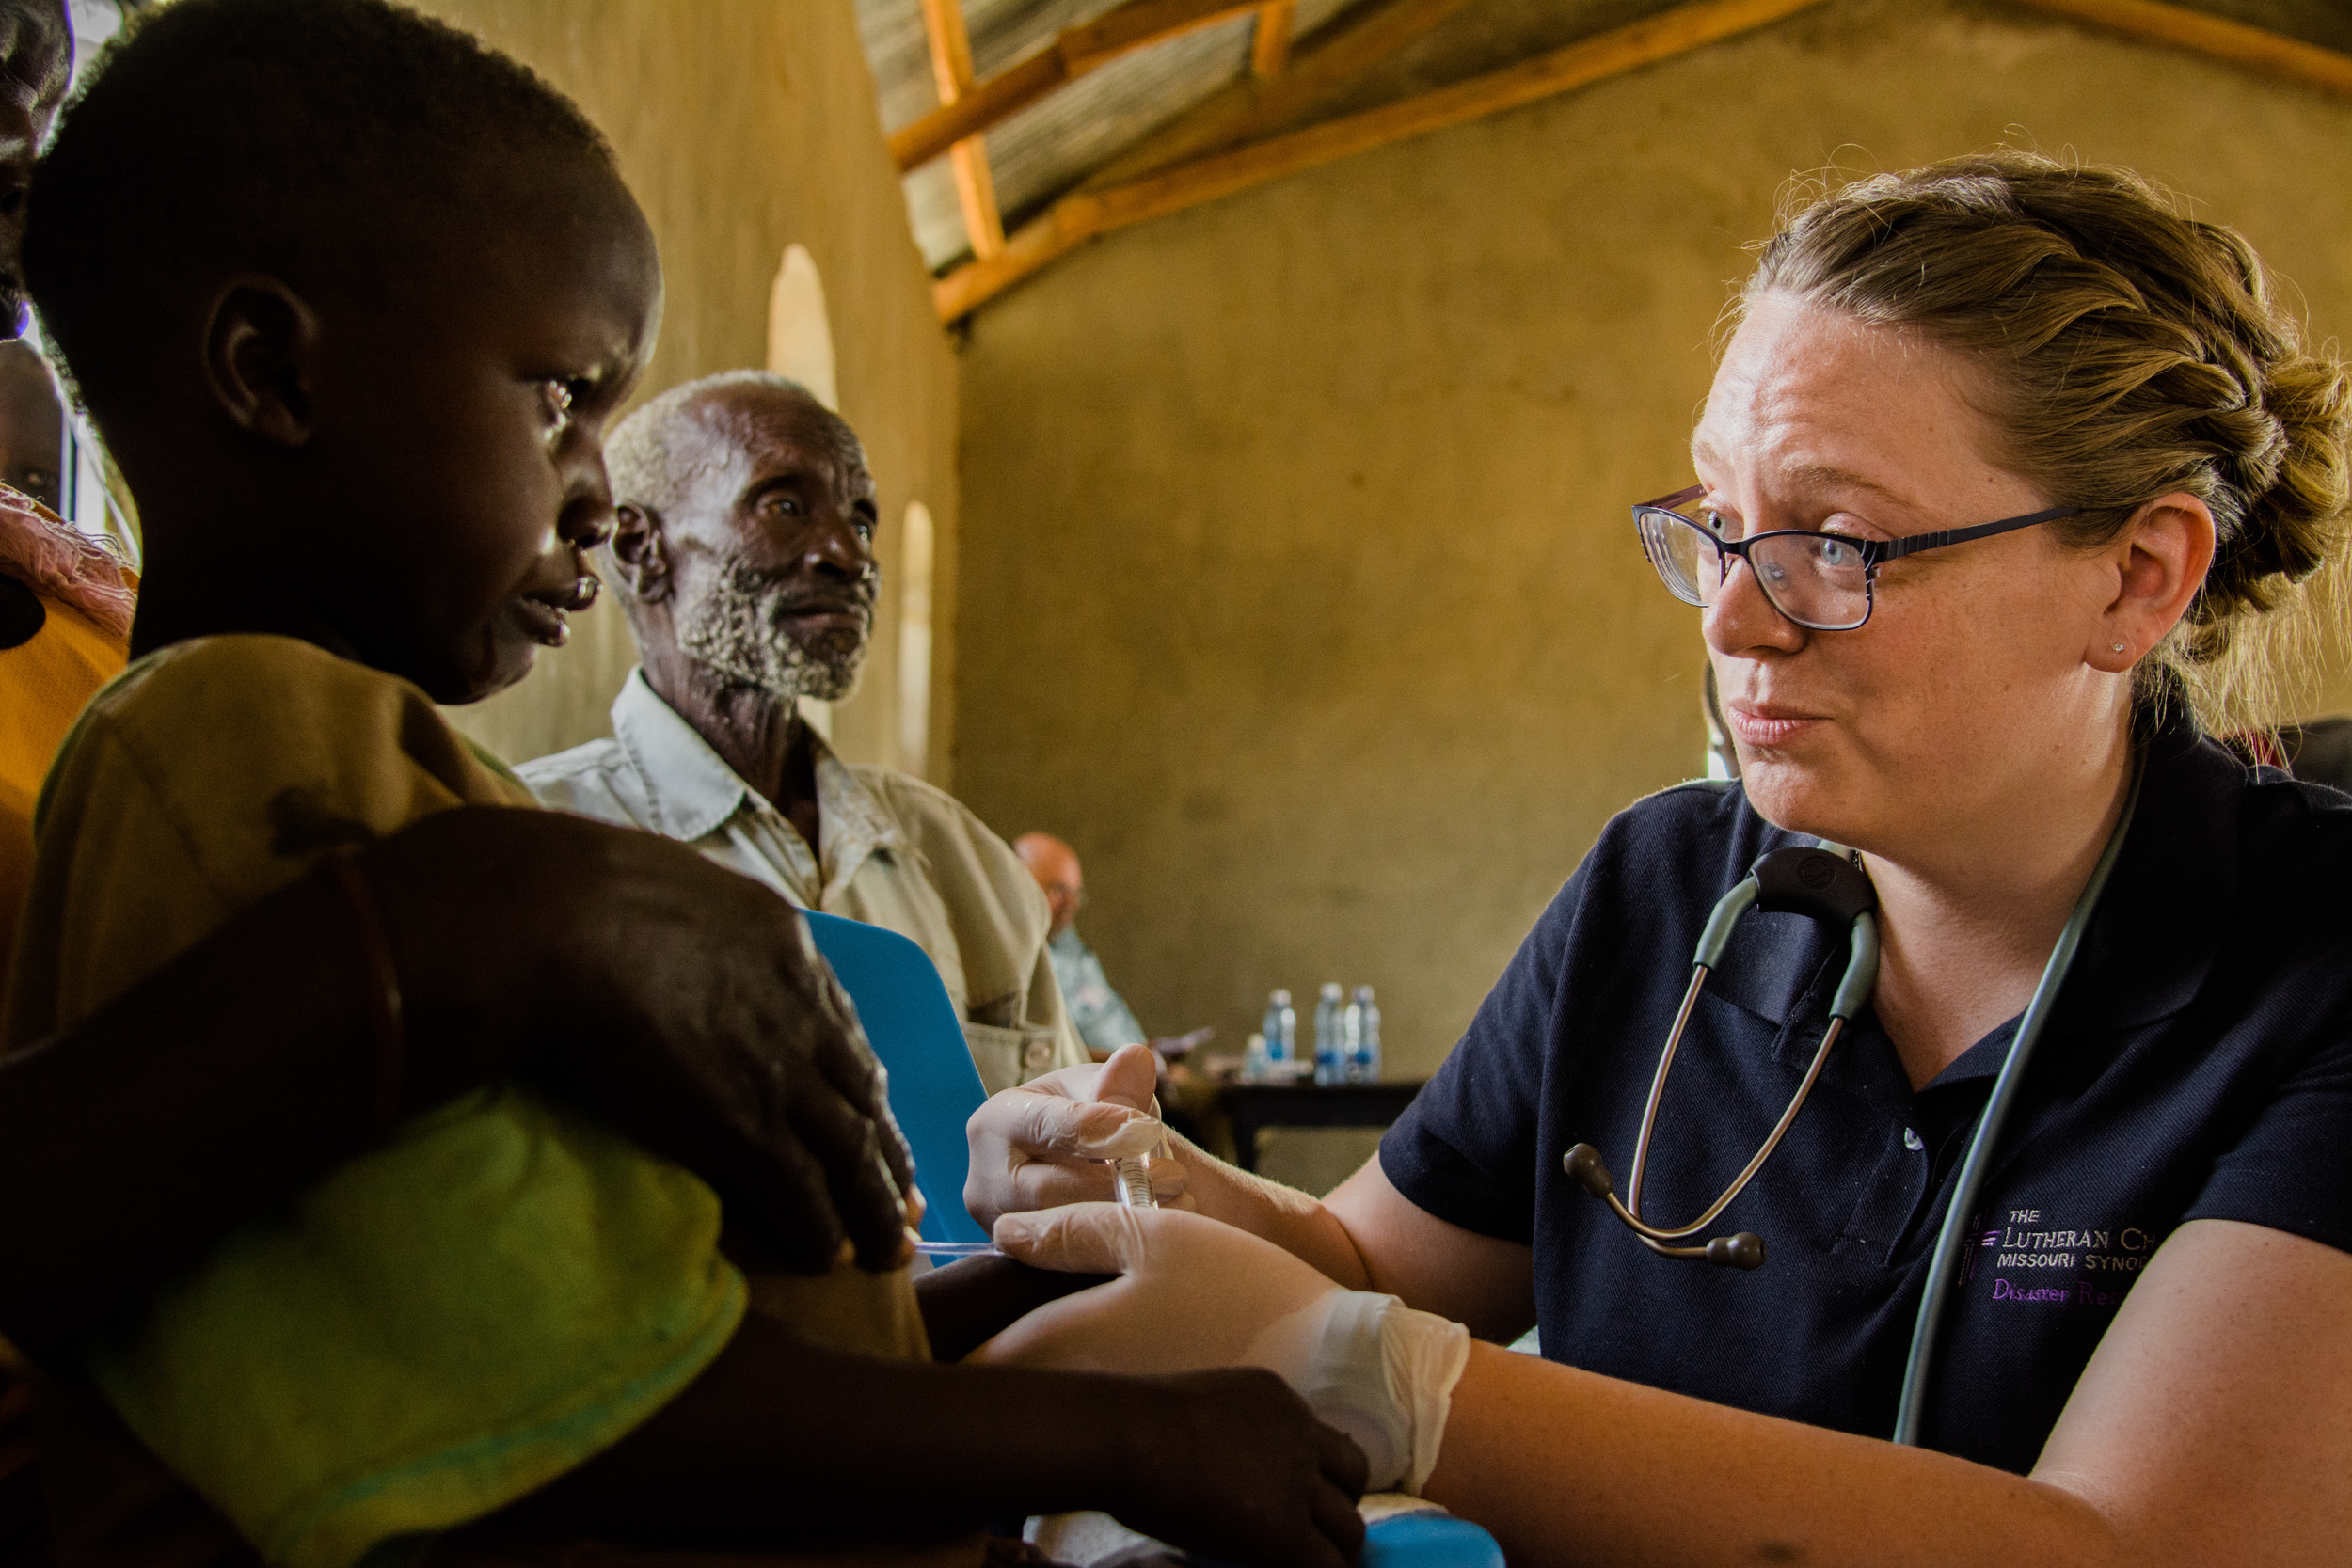 Sarah speaks reassuringly to a little girl receiving IV fluids.